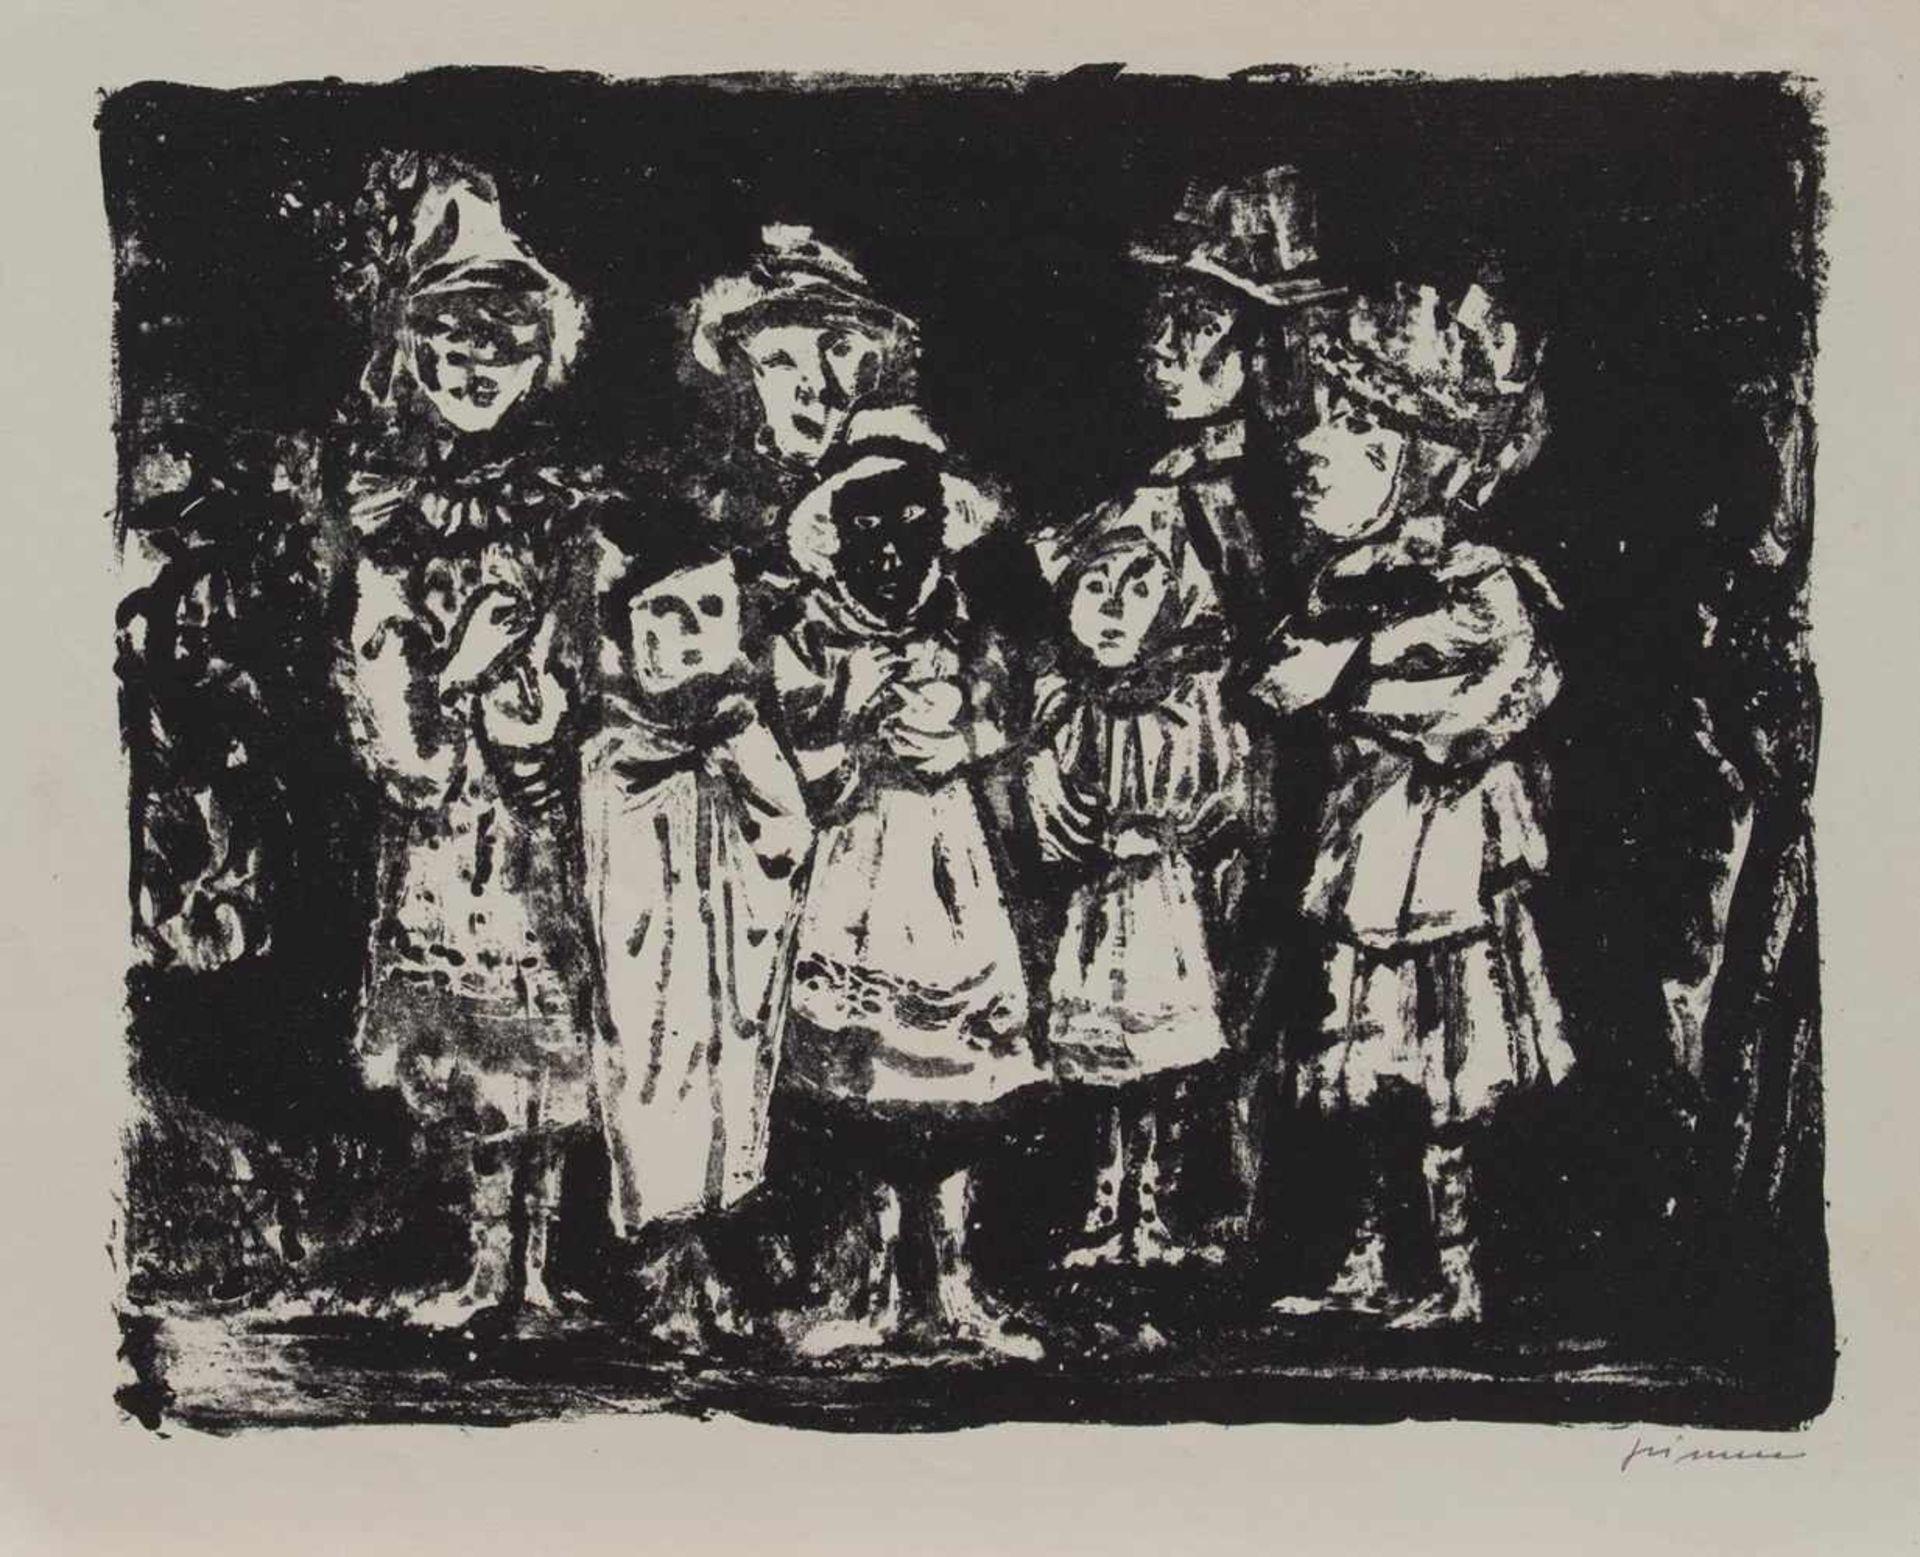 Los 13 - Wilhelm Grimm (Eberstadt 1904 - 1986 Hamburg, deutscher Maler u. Grafiker, Std. a.d. Werkkunstschule